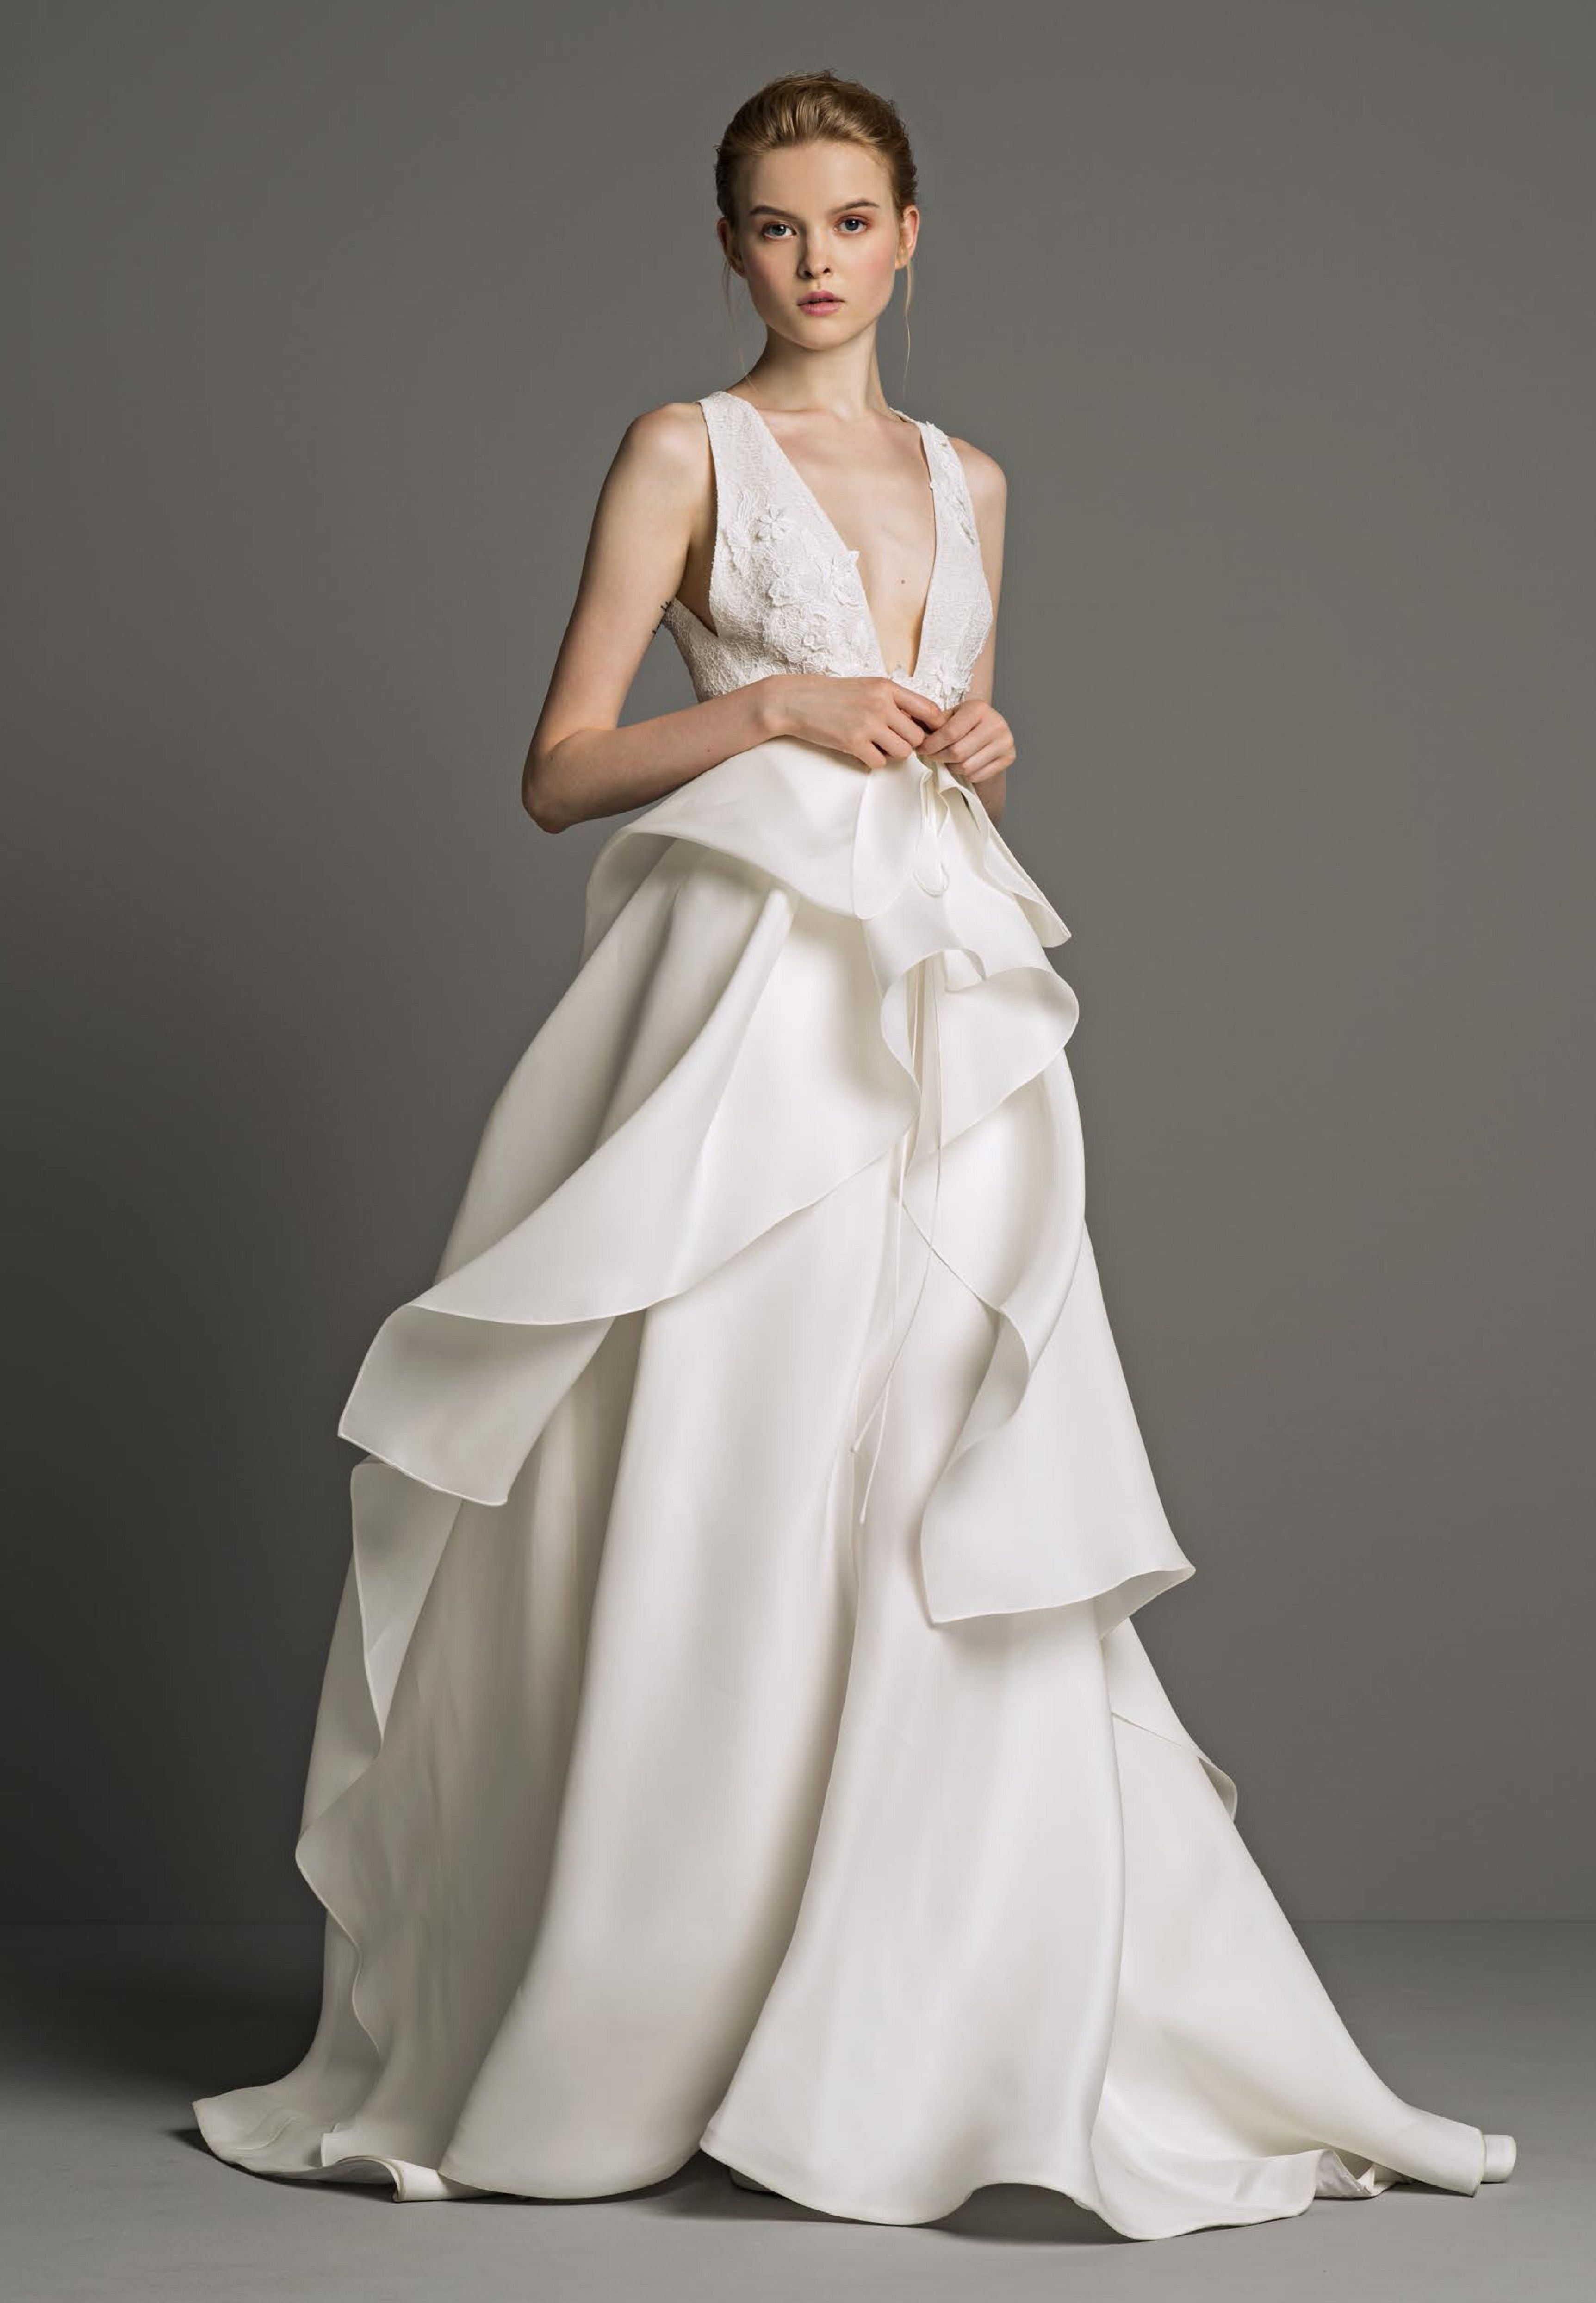 Abiti Da Cerimonia Italiani.Yasmine Peter Langner Weddingdress Con Immagini Vestiti Da